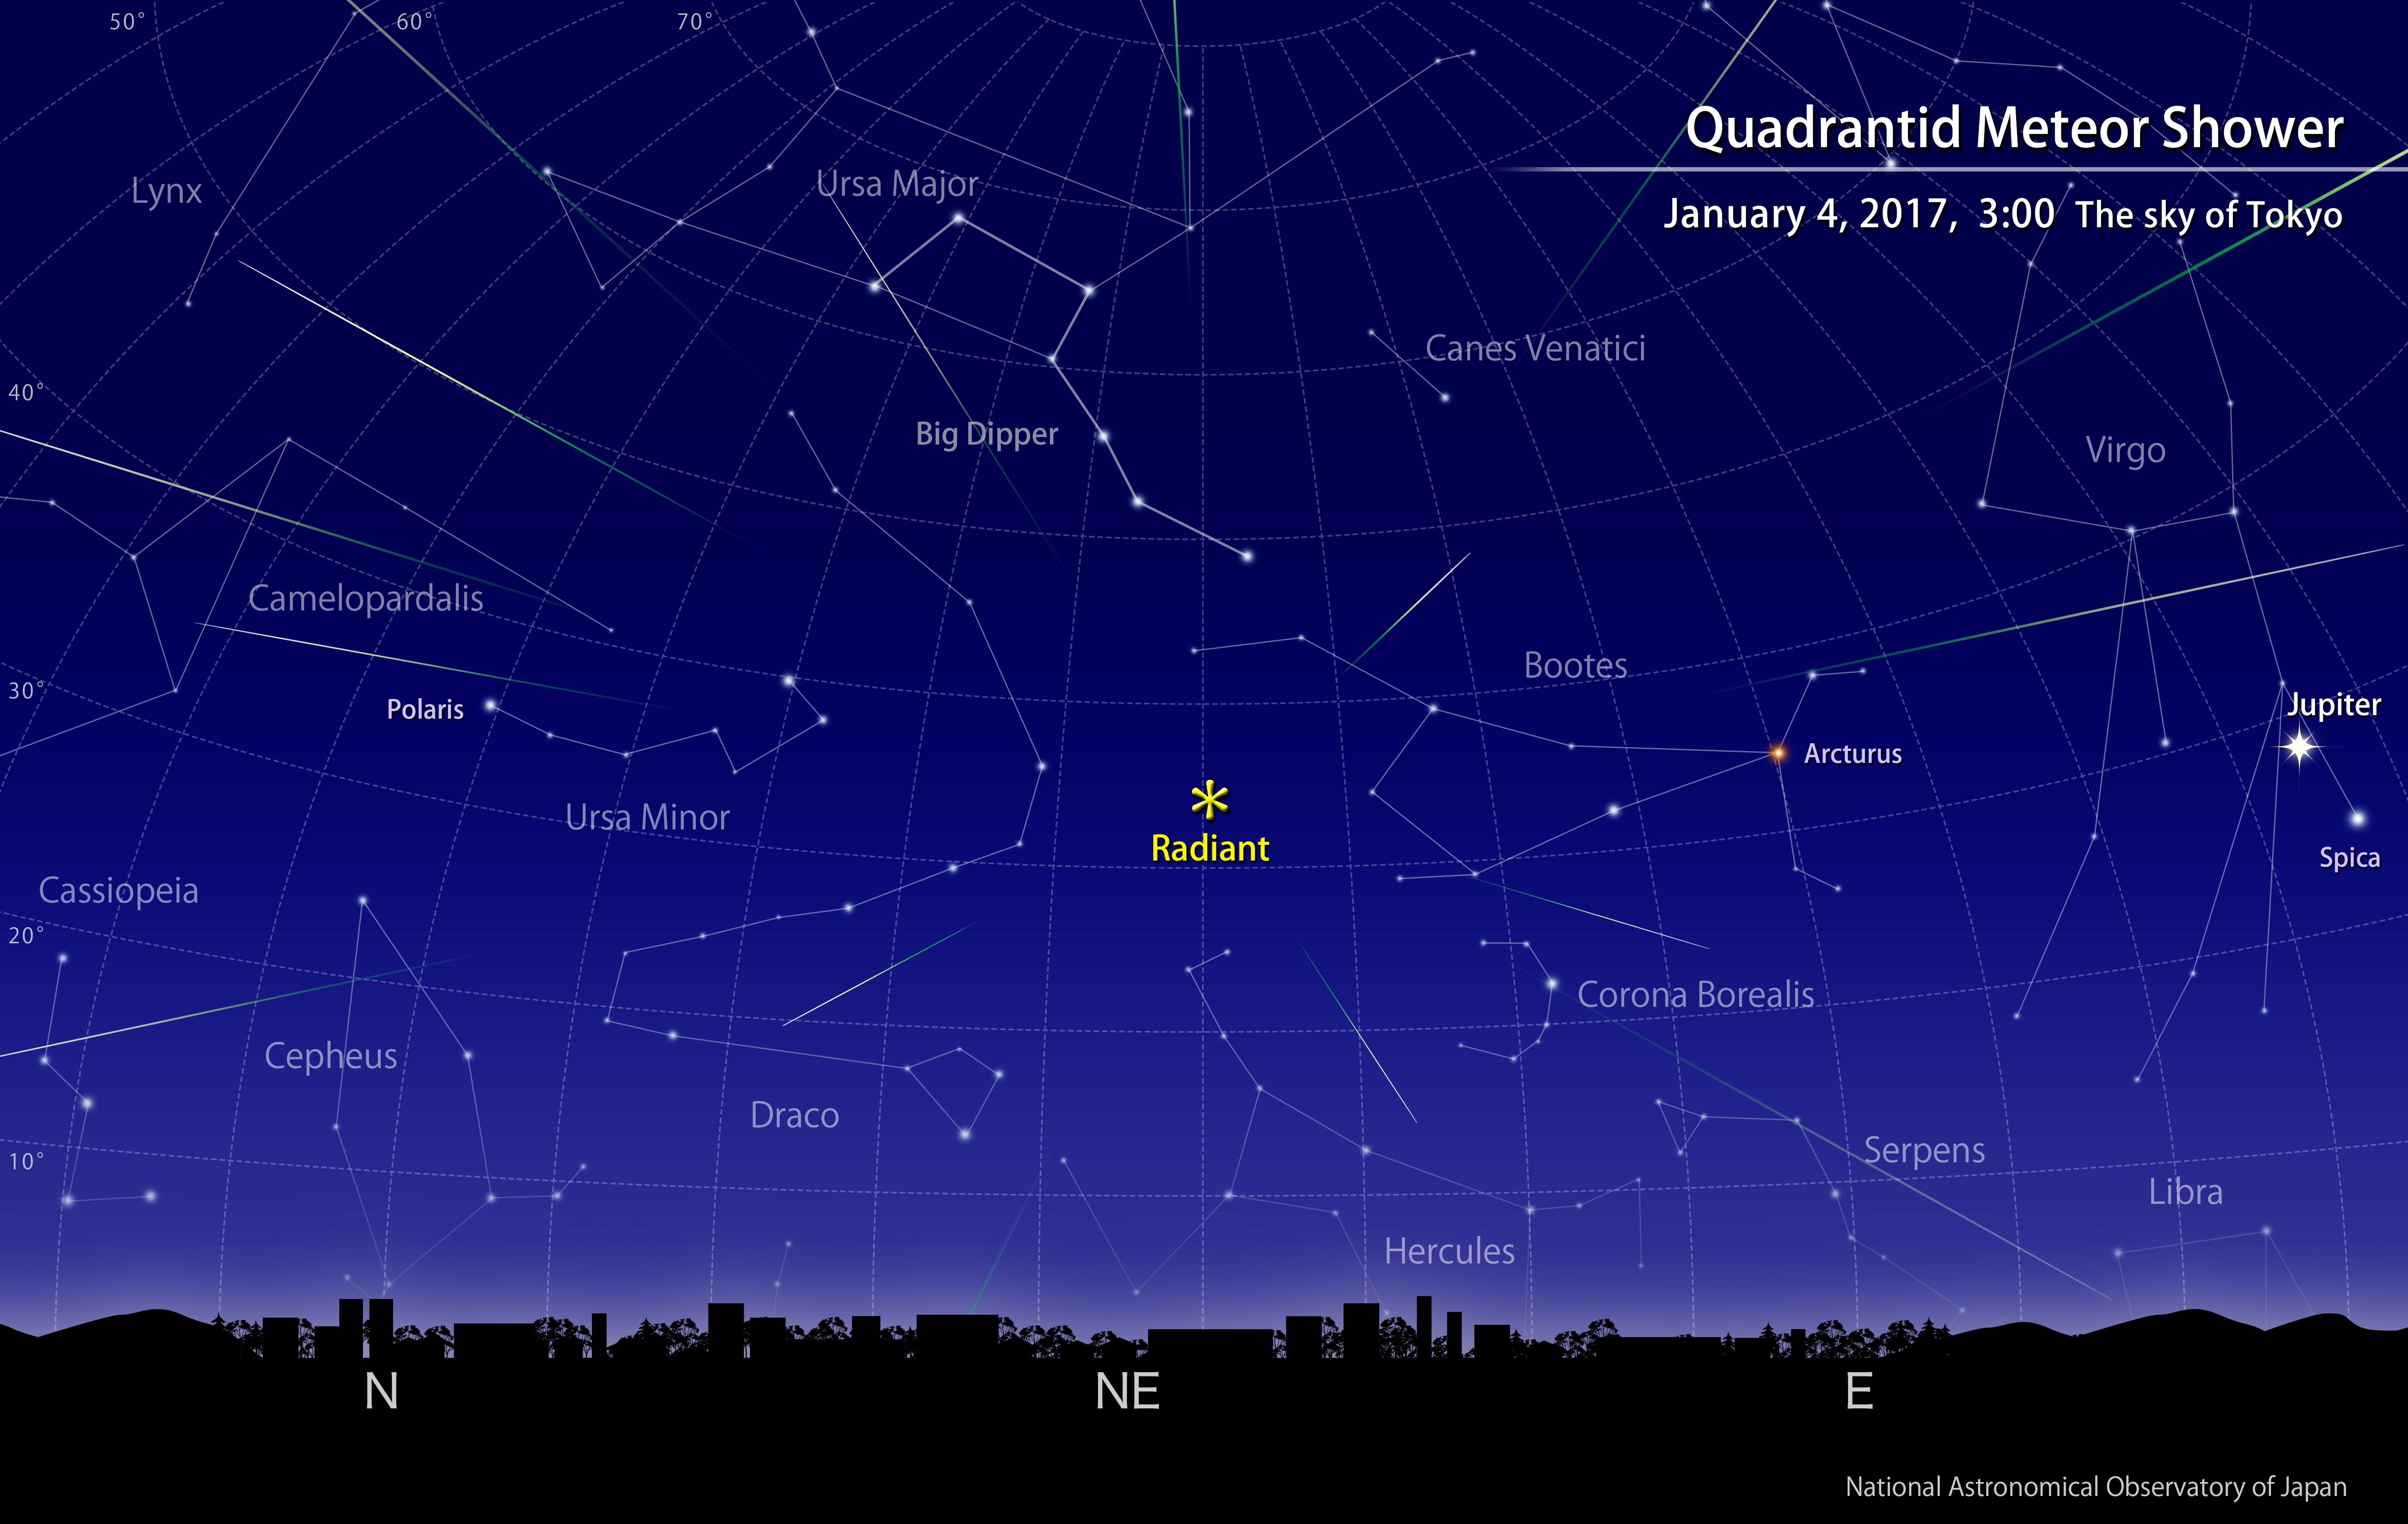 Quadrantid Meteor Shower (January, 2017) | NAOJ: National ...